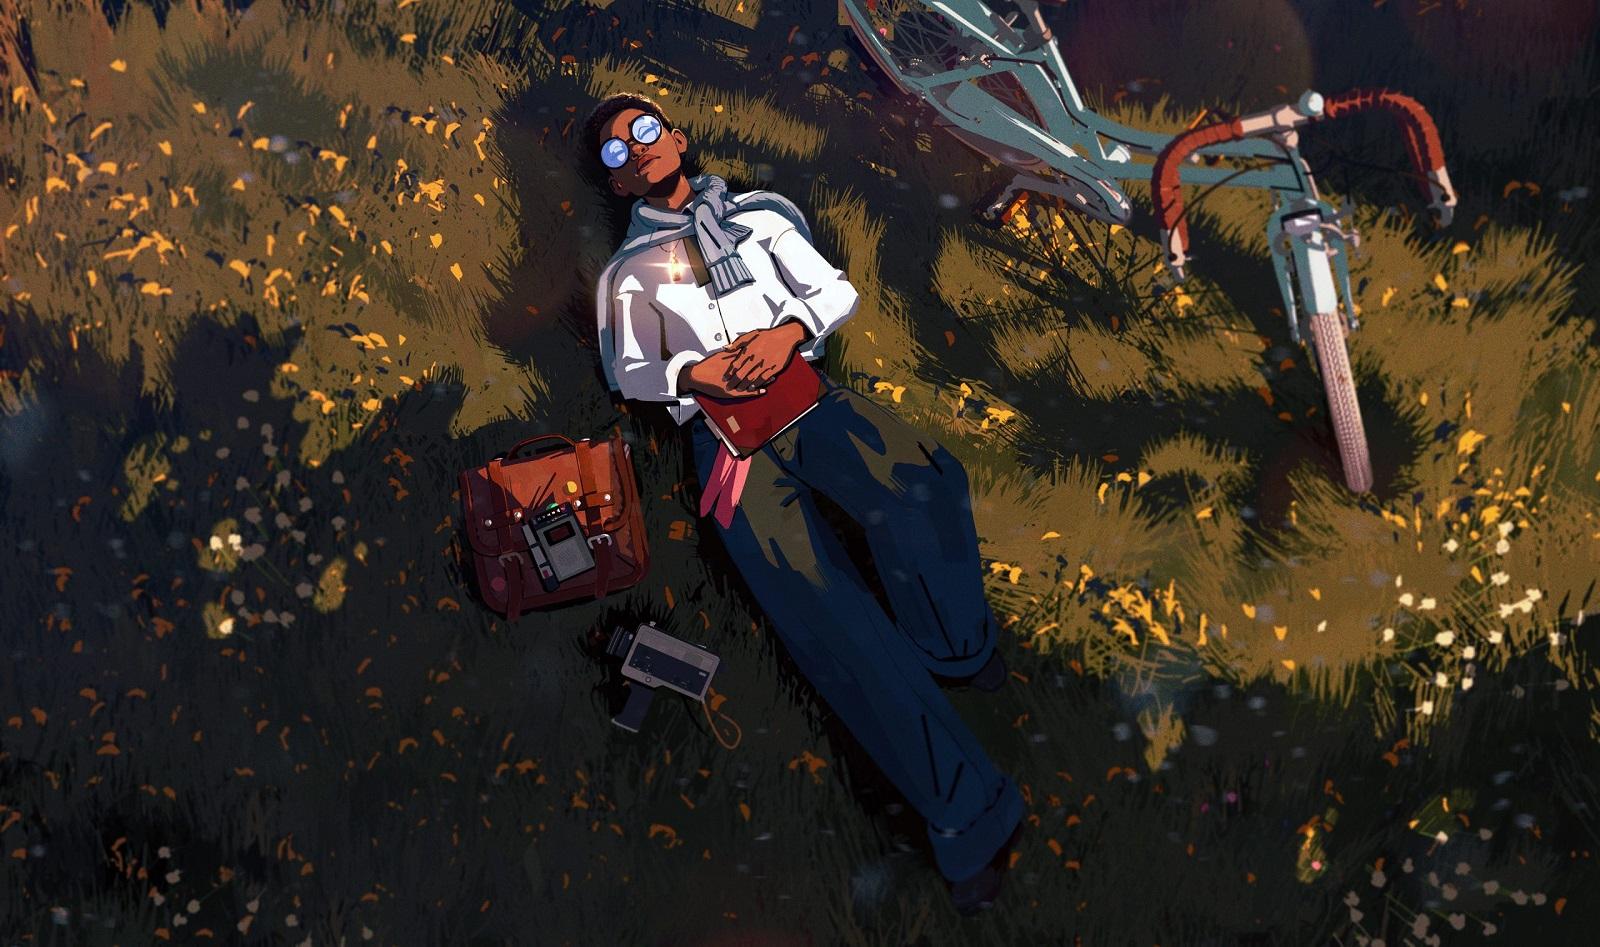 Предапокалиптическое приключение Season станет чем-то средним между Breath of the Wild и Journey